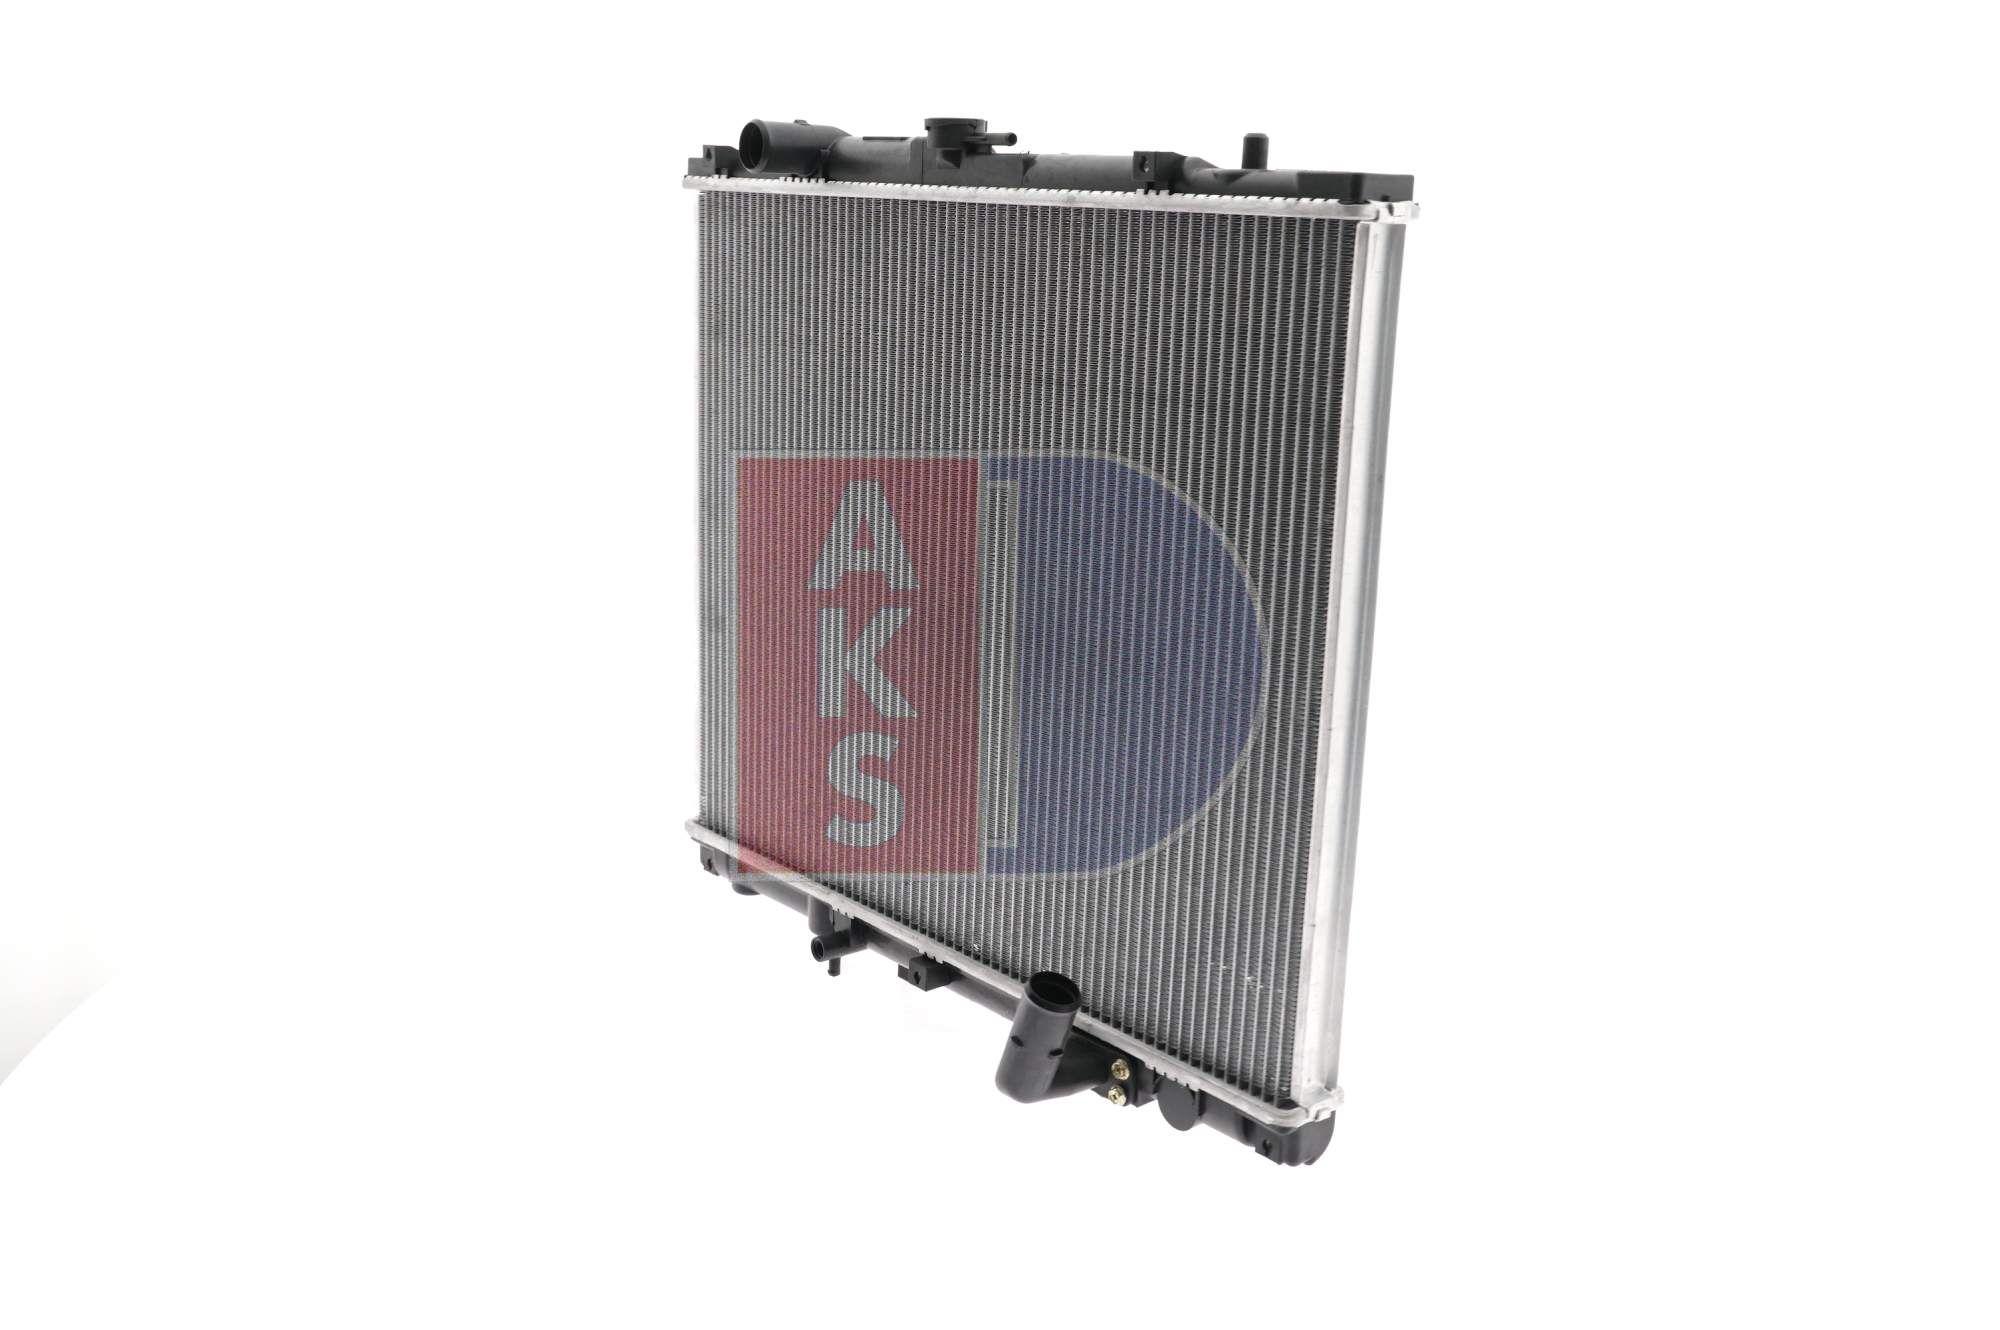 140017N Kühler AKS DASIS - Markenprodukte billig